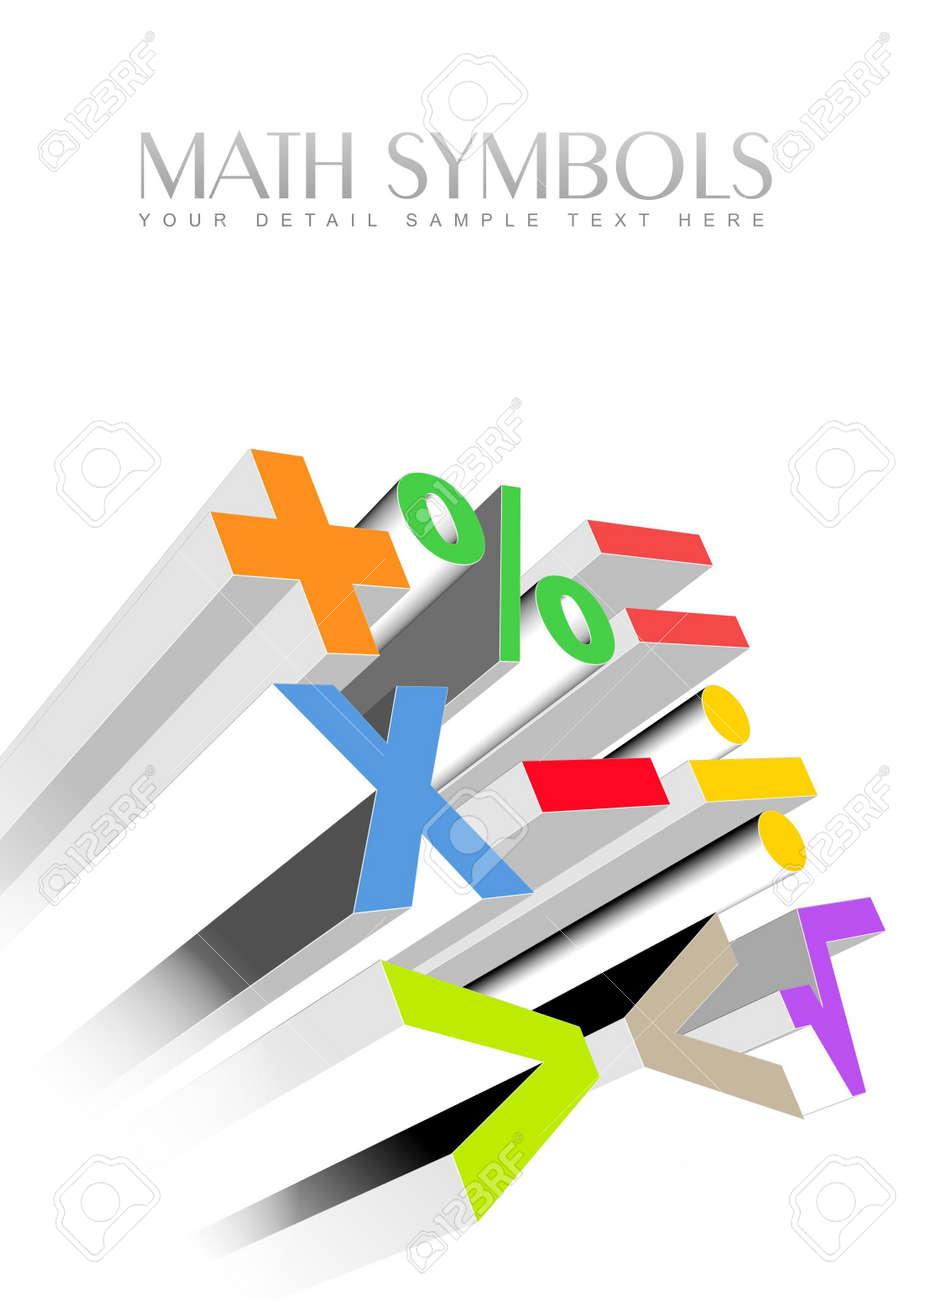 An illustration of 3d colorful math symbols stock photo picture an illustration of 3d colorful math symbols stock illustration 7955281 biocorpaavc Image collections